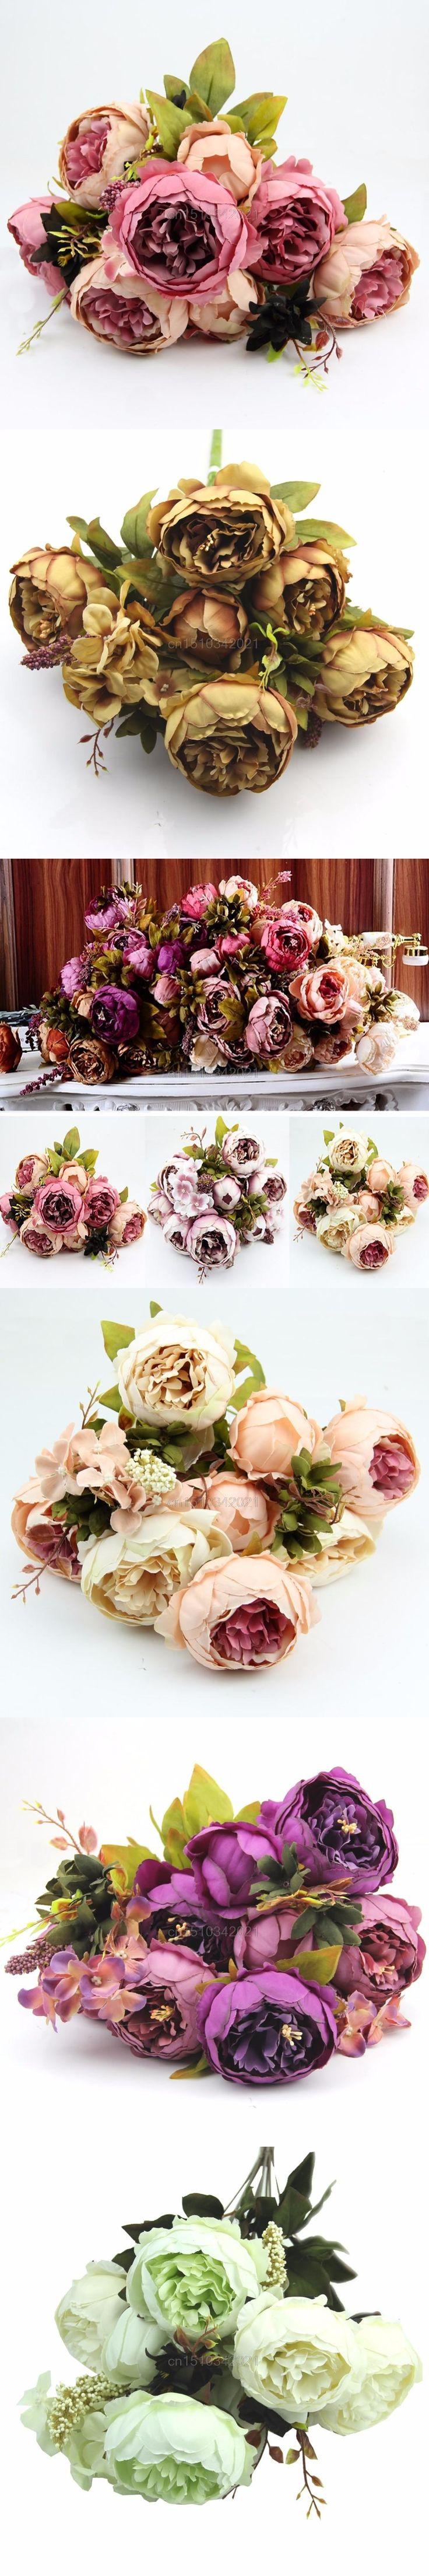 Peony Silk Flower 10Head of Bouquet Vintage Artificial Peony Silk Flower Room Wedding Floral Decor